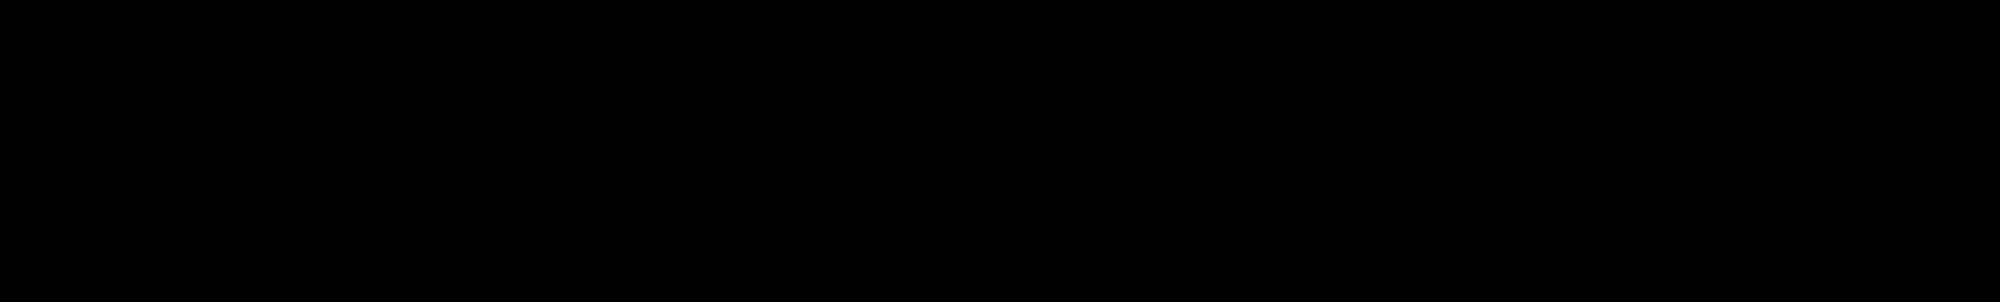 Harman_kardon_Logo